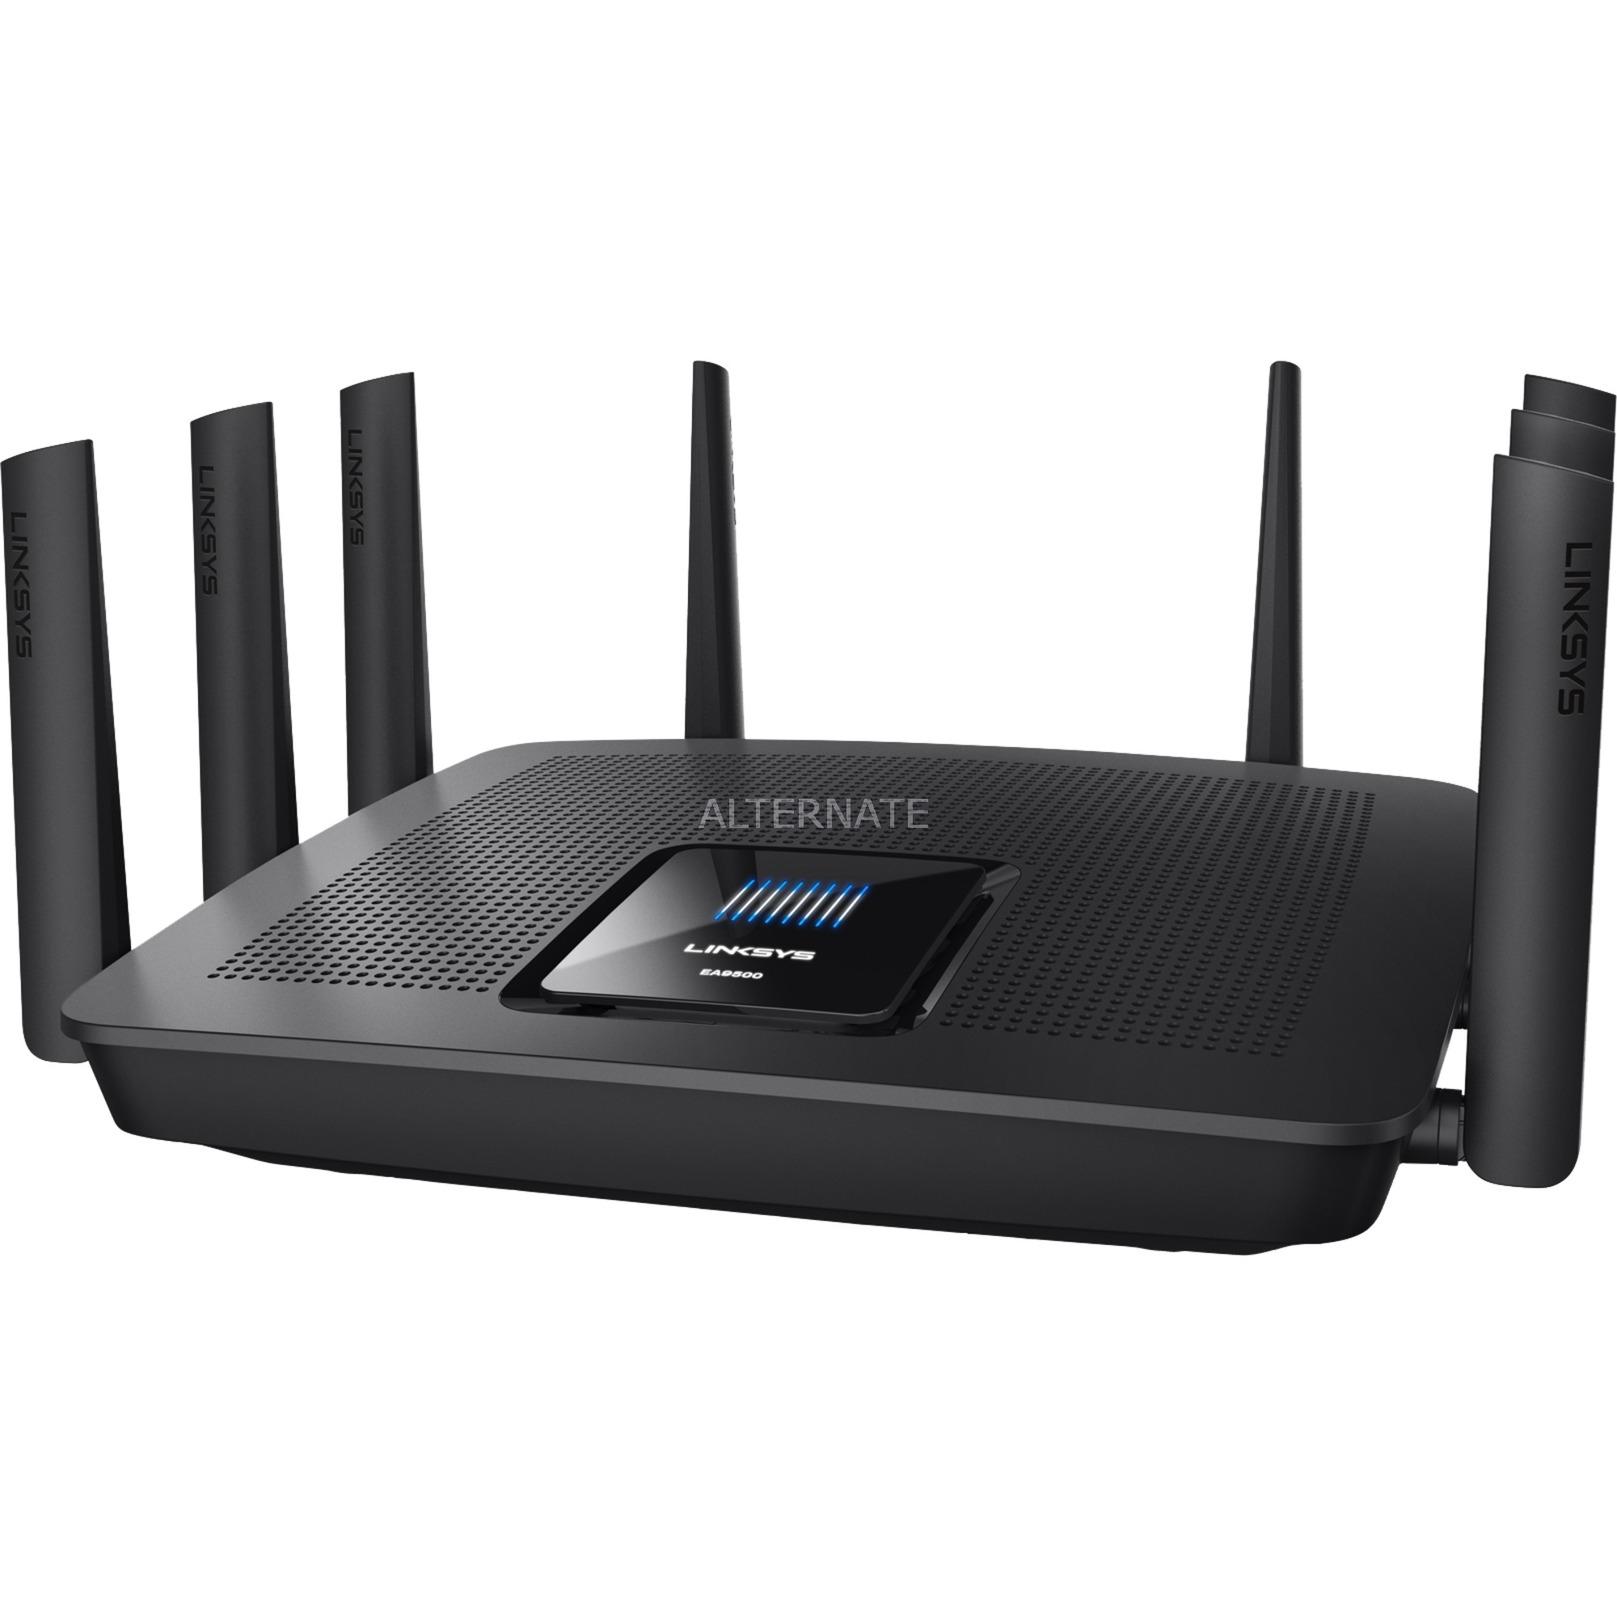 AC5400 Tribanda (2,4 GHz/5 GHz/5 GHz) Gigabit Ethernet Negro router inalámbrico